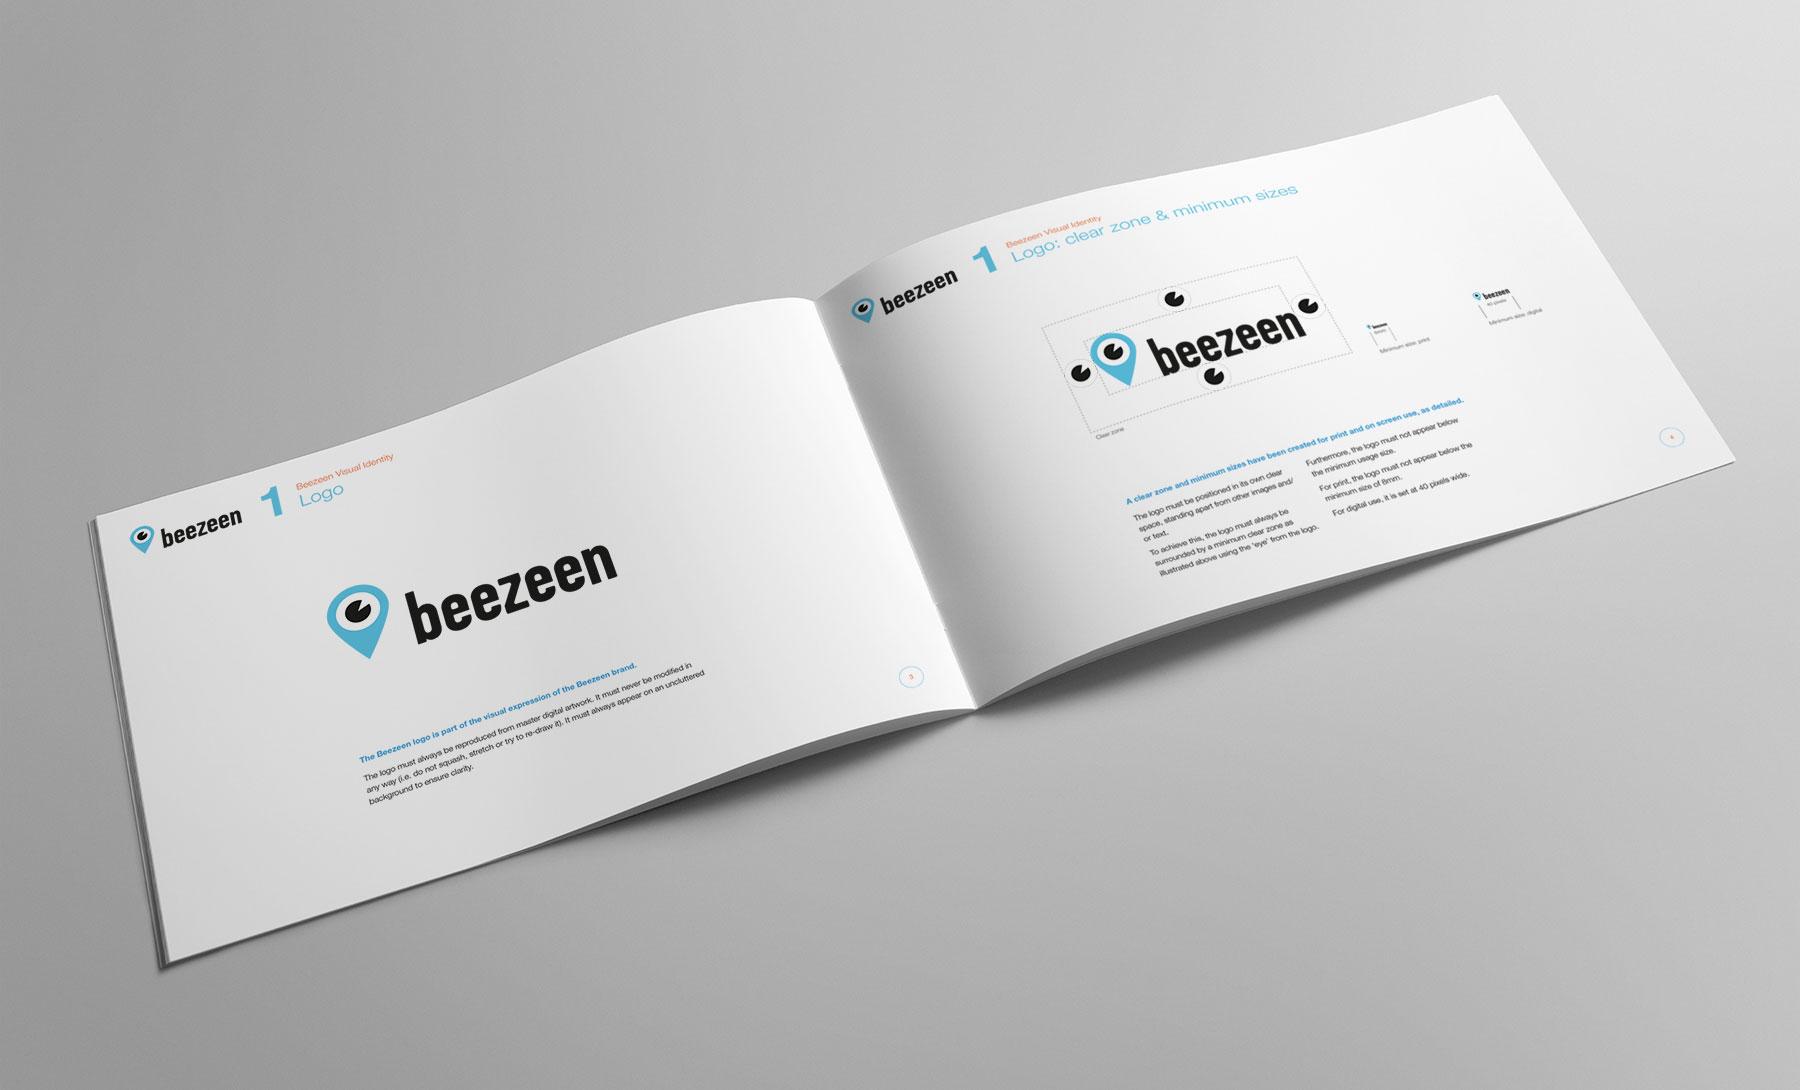 Beezeen visual identity design